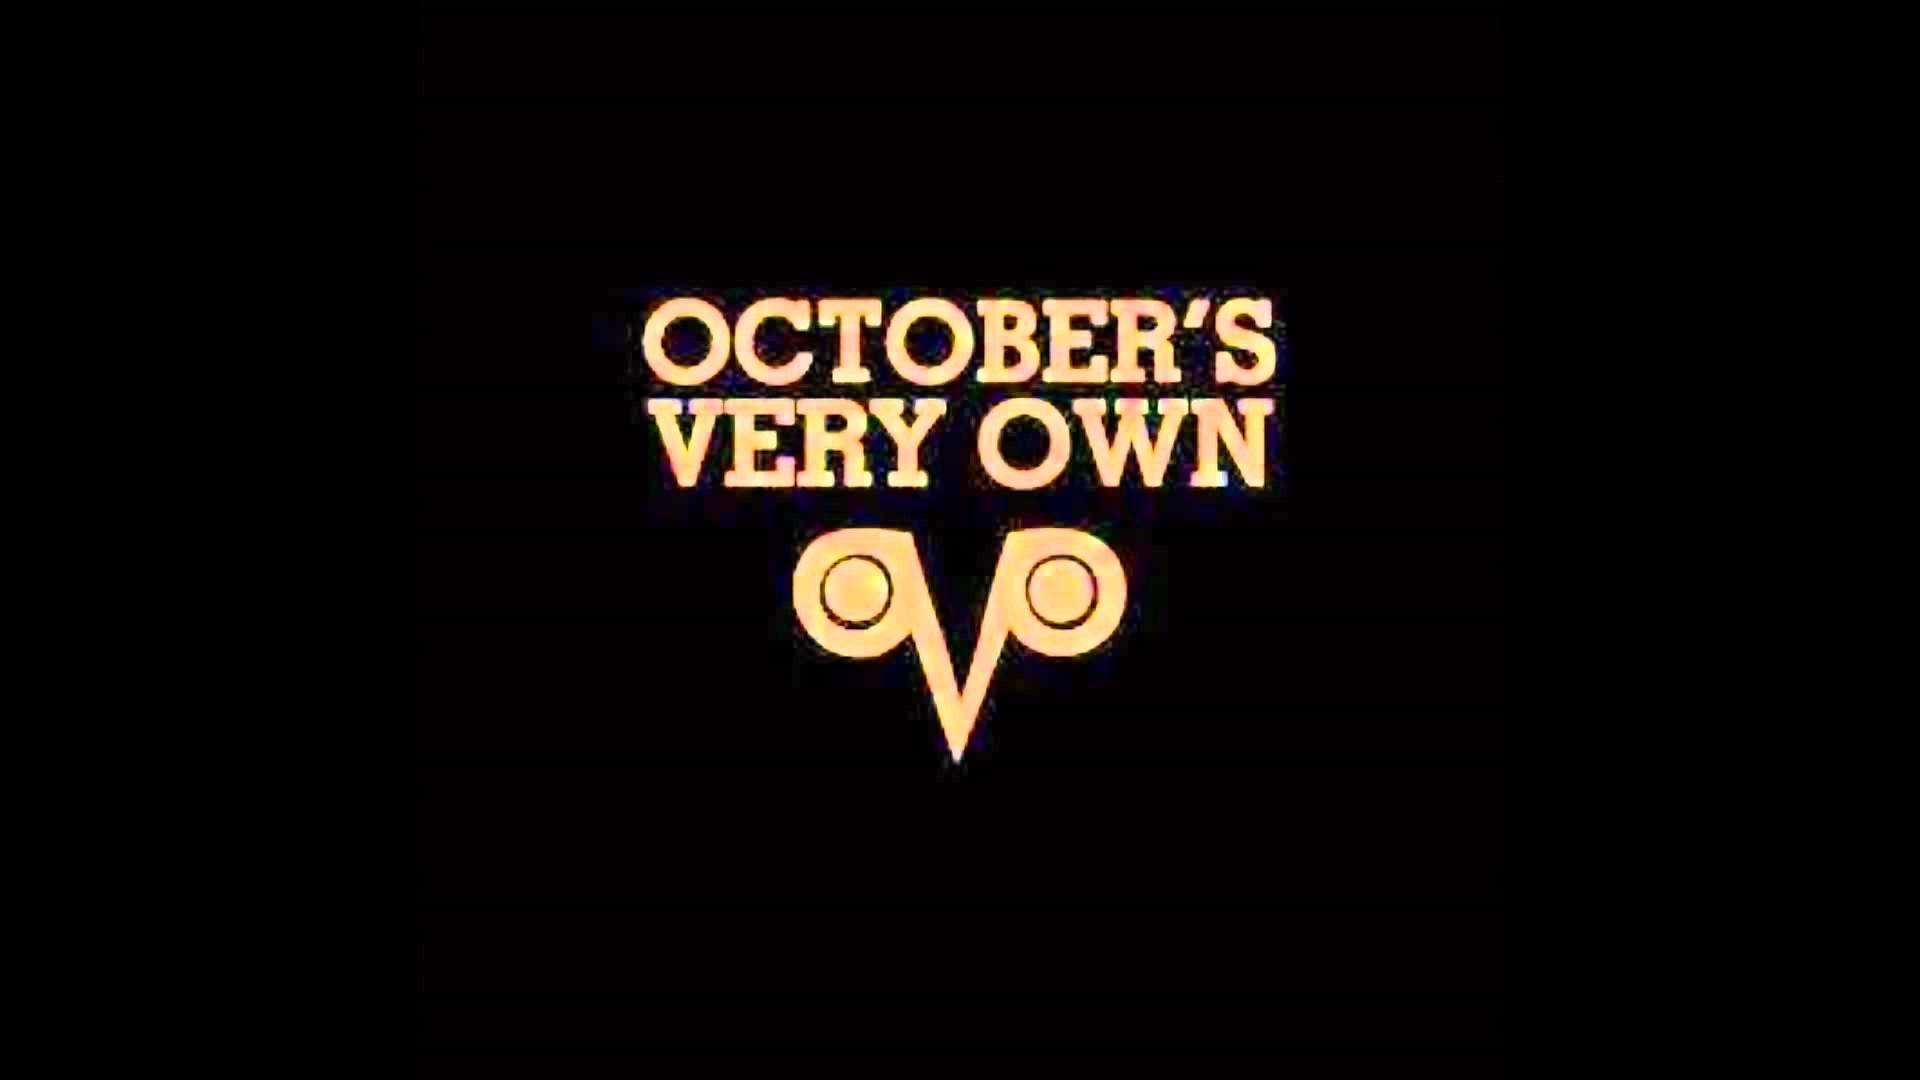 OVO Owl Phone wallpaper HD by manbearpagan on DeviantArt .